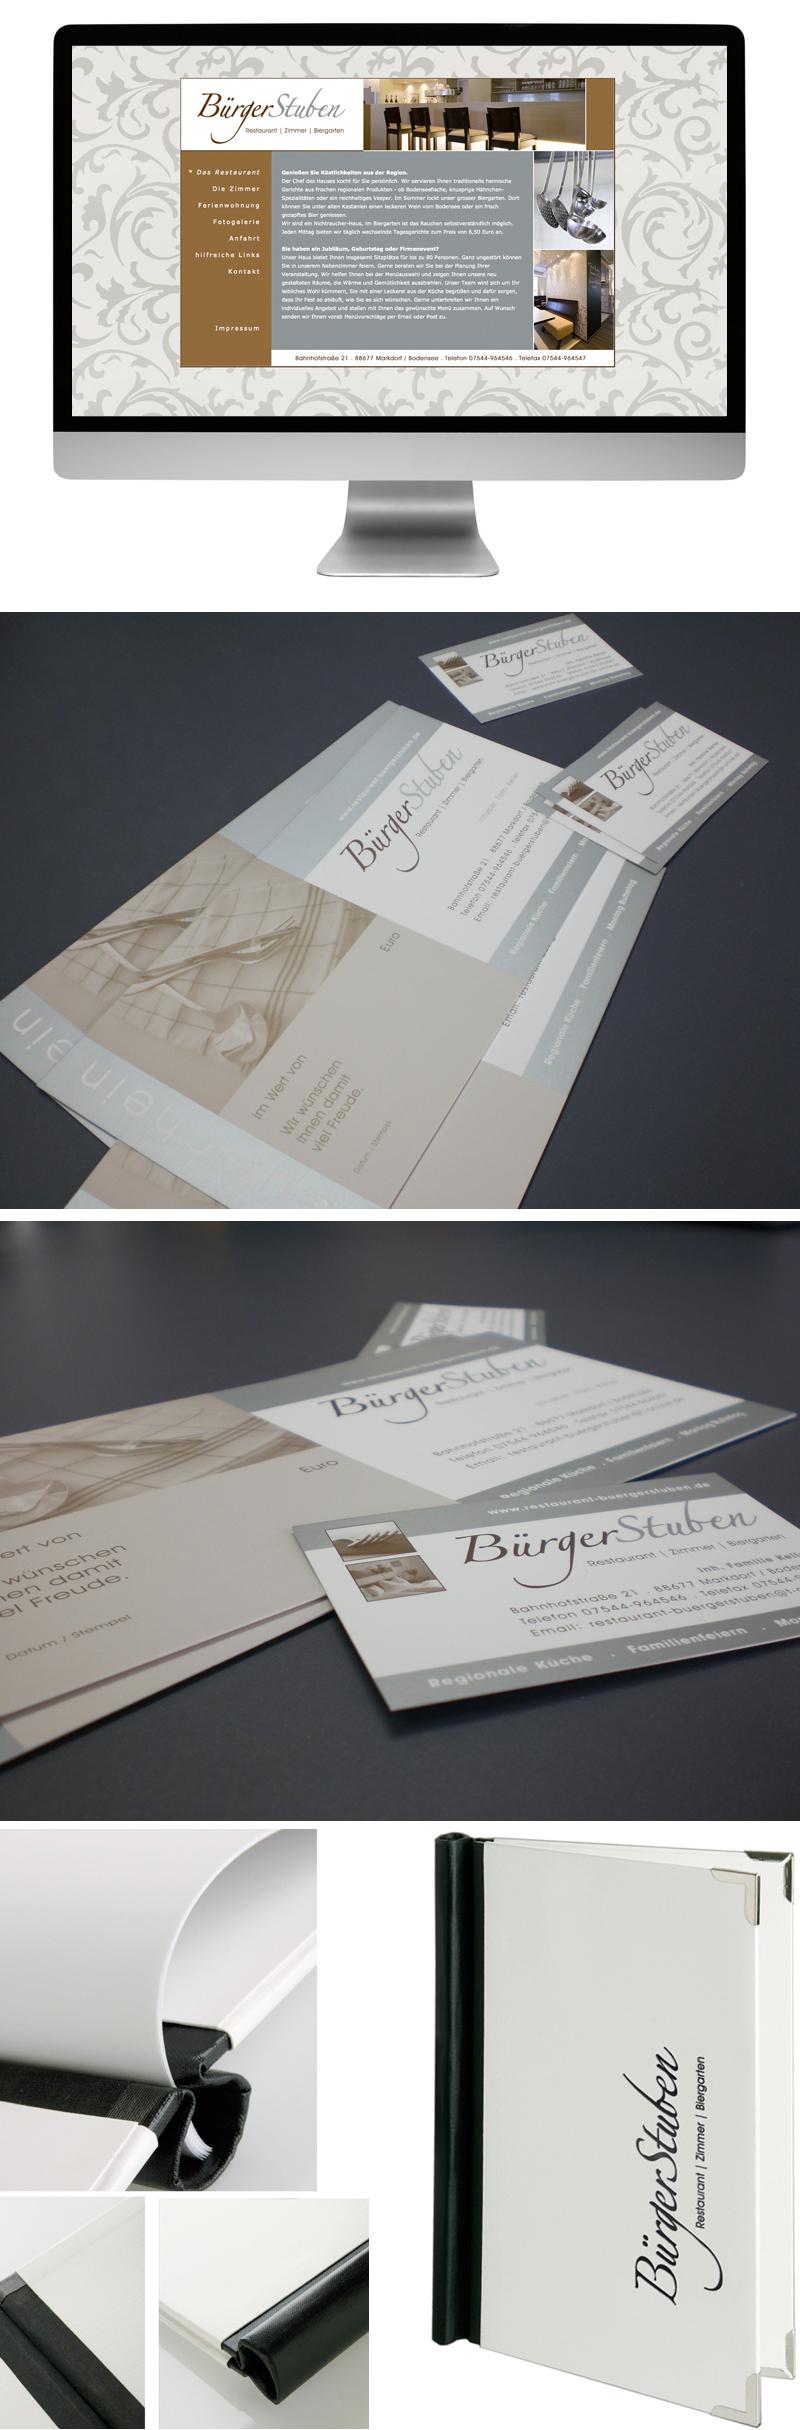 corporate-design-webdesign-buergerstube-markdorf